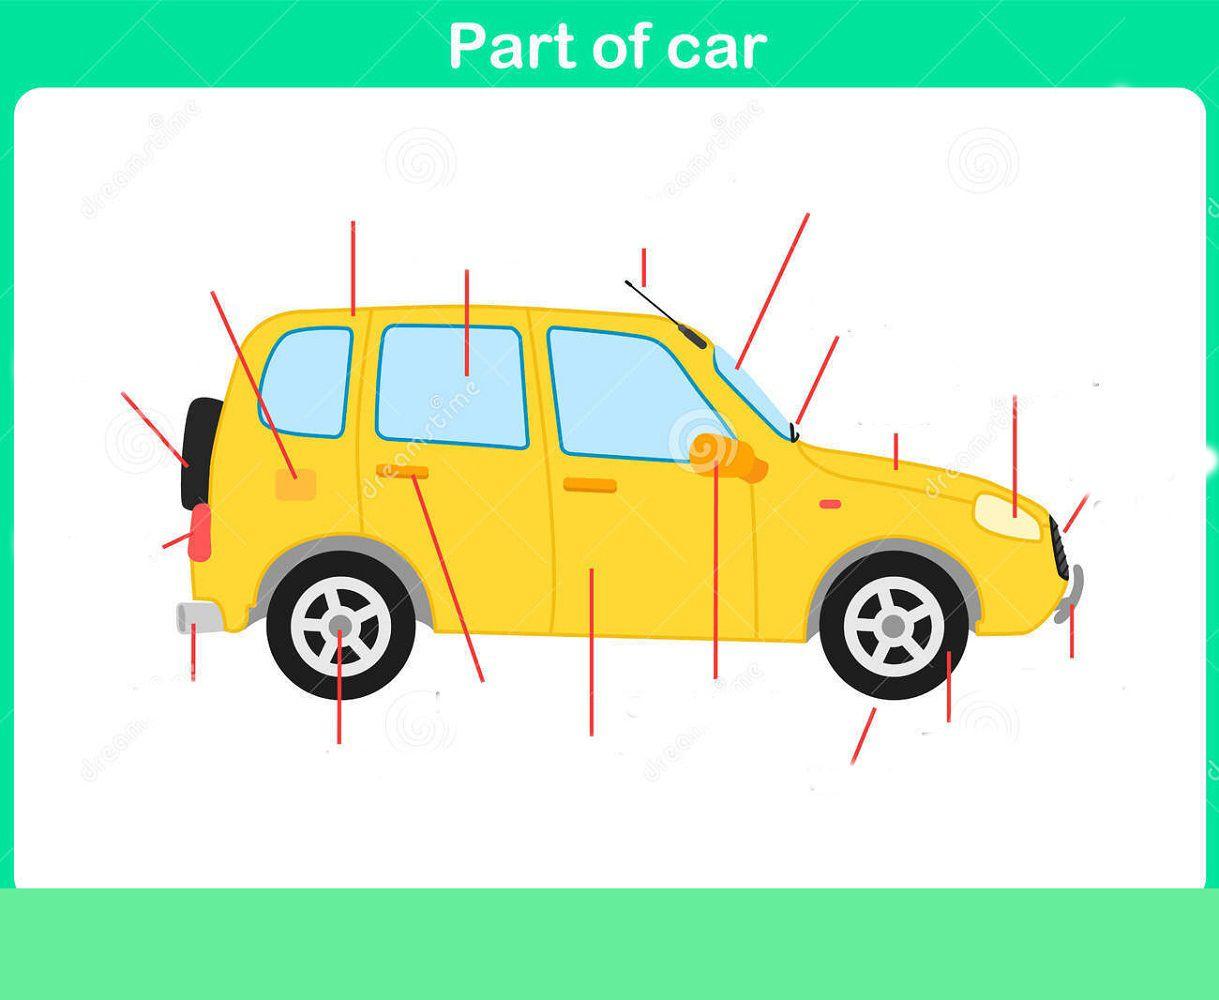 Car Diagram Without Labels